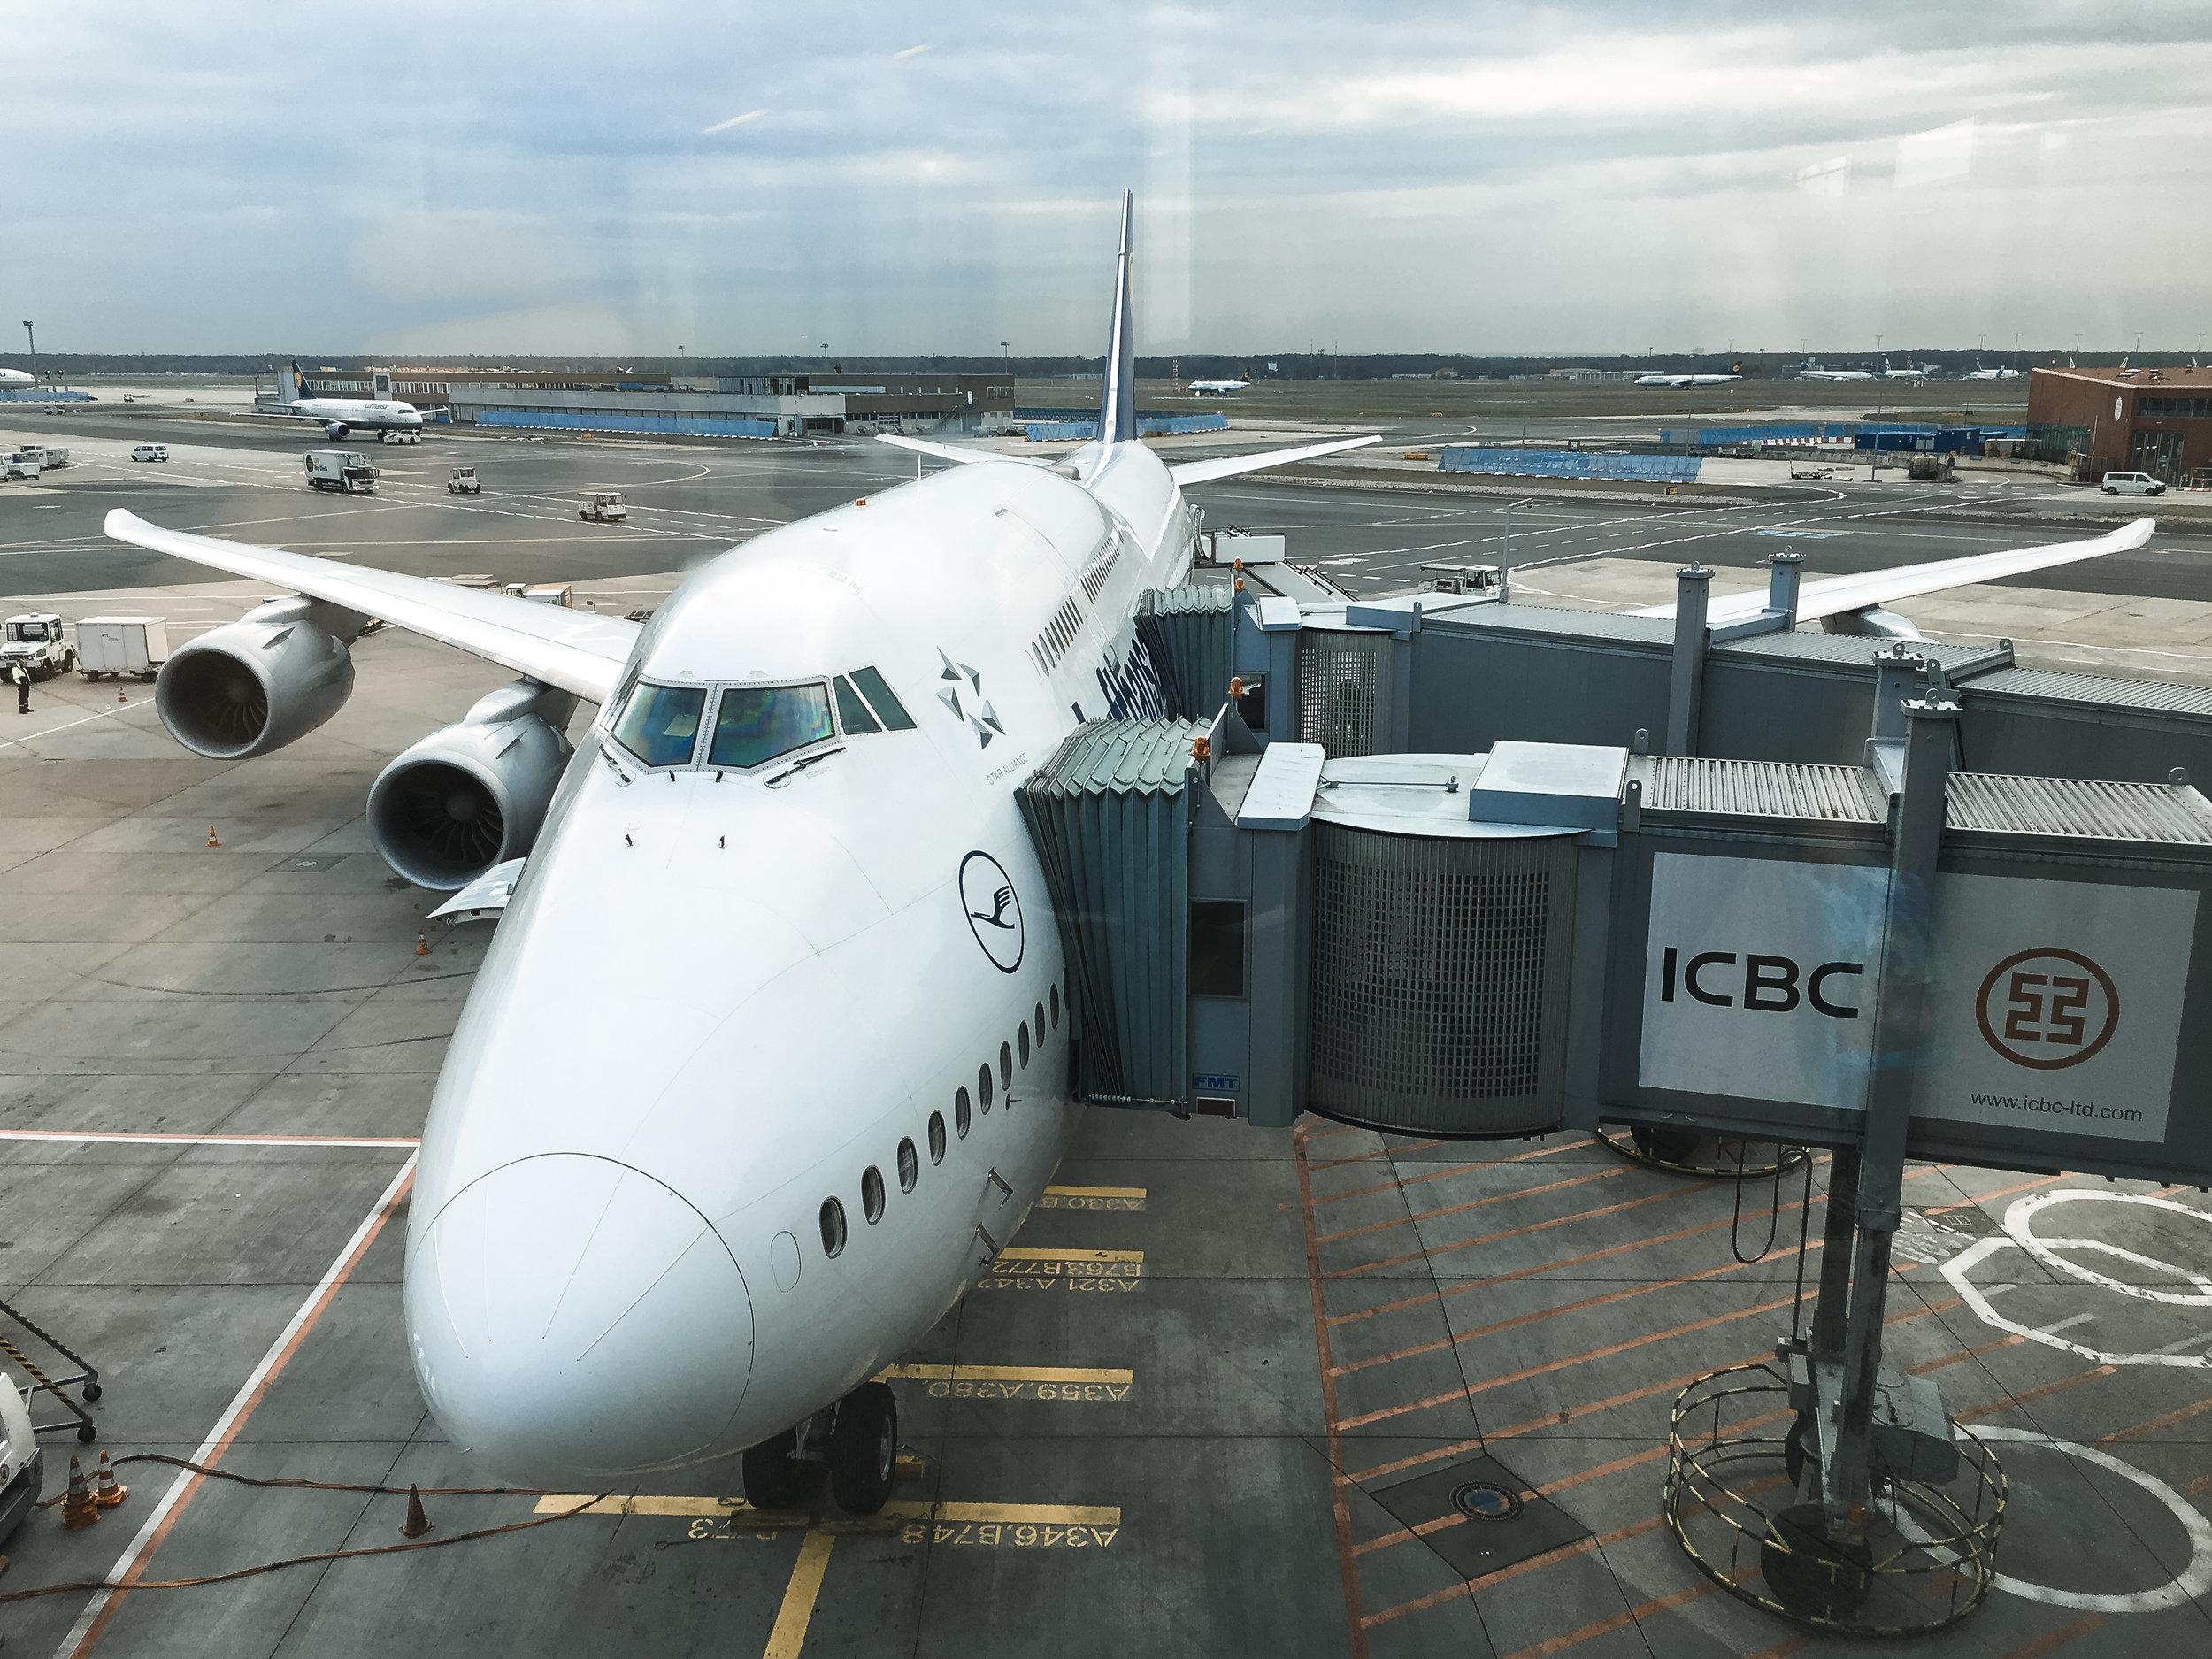 Lufthansa-0860.jpg